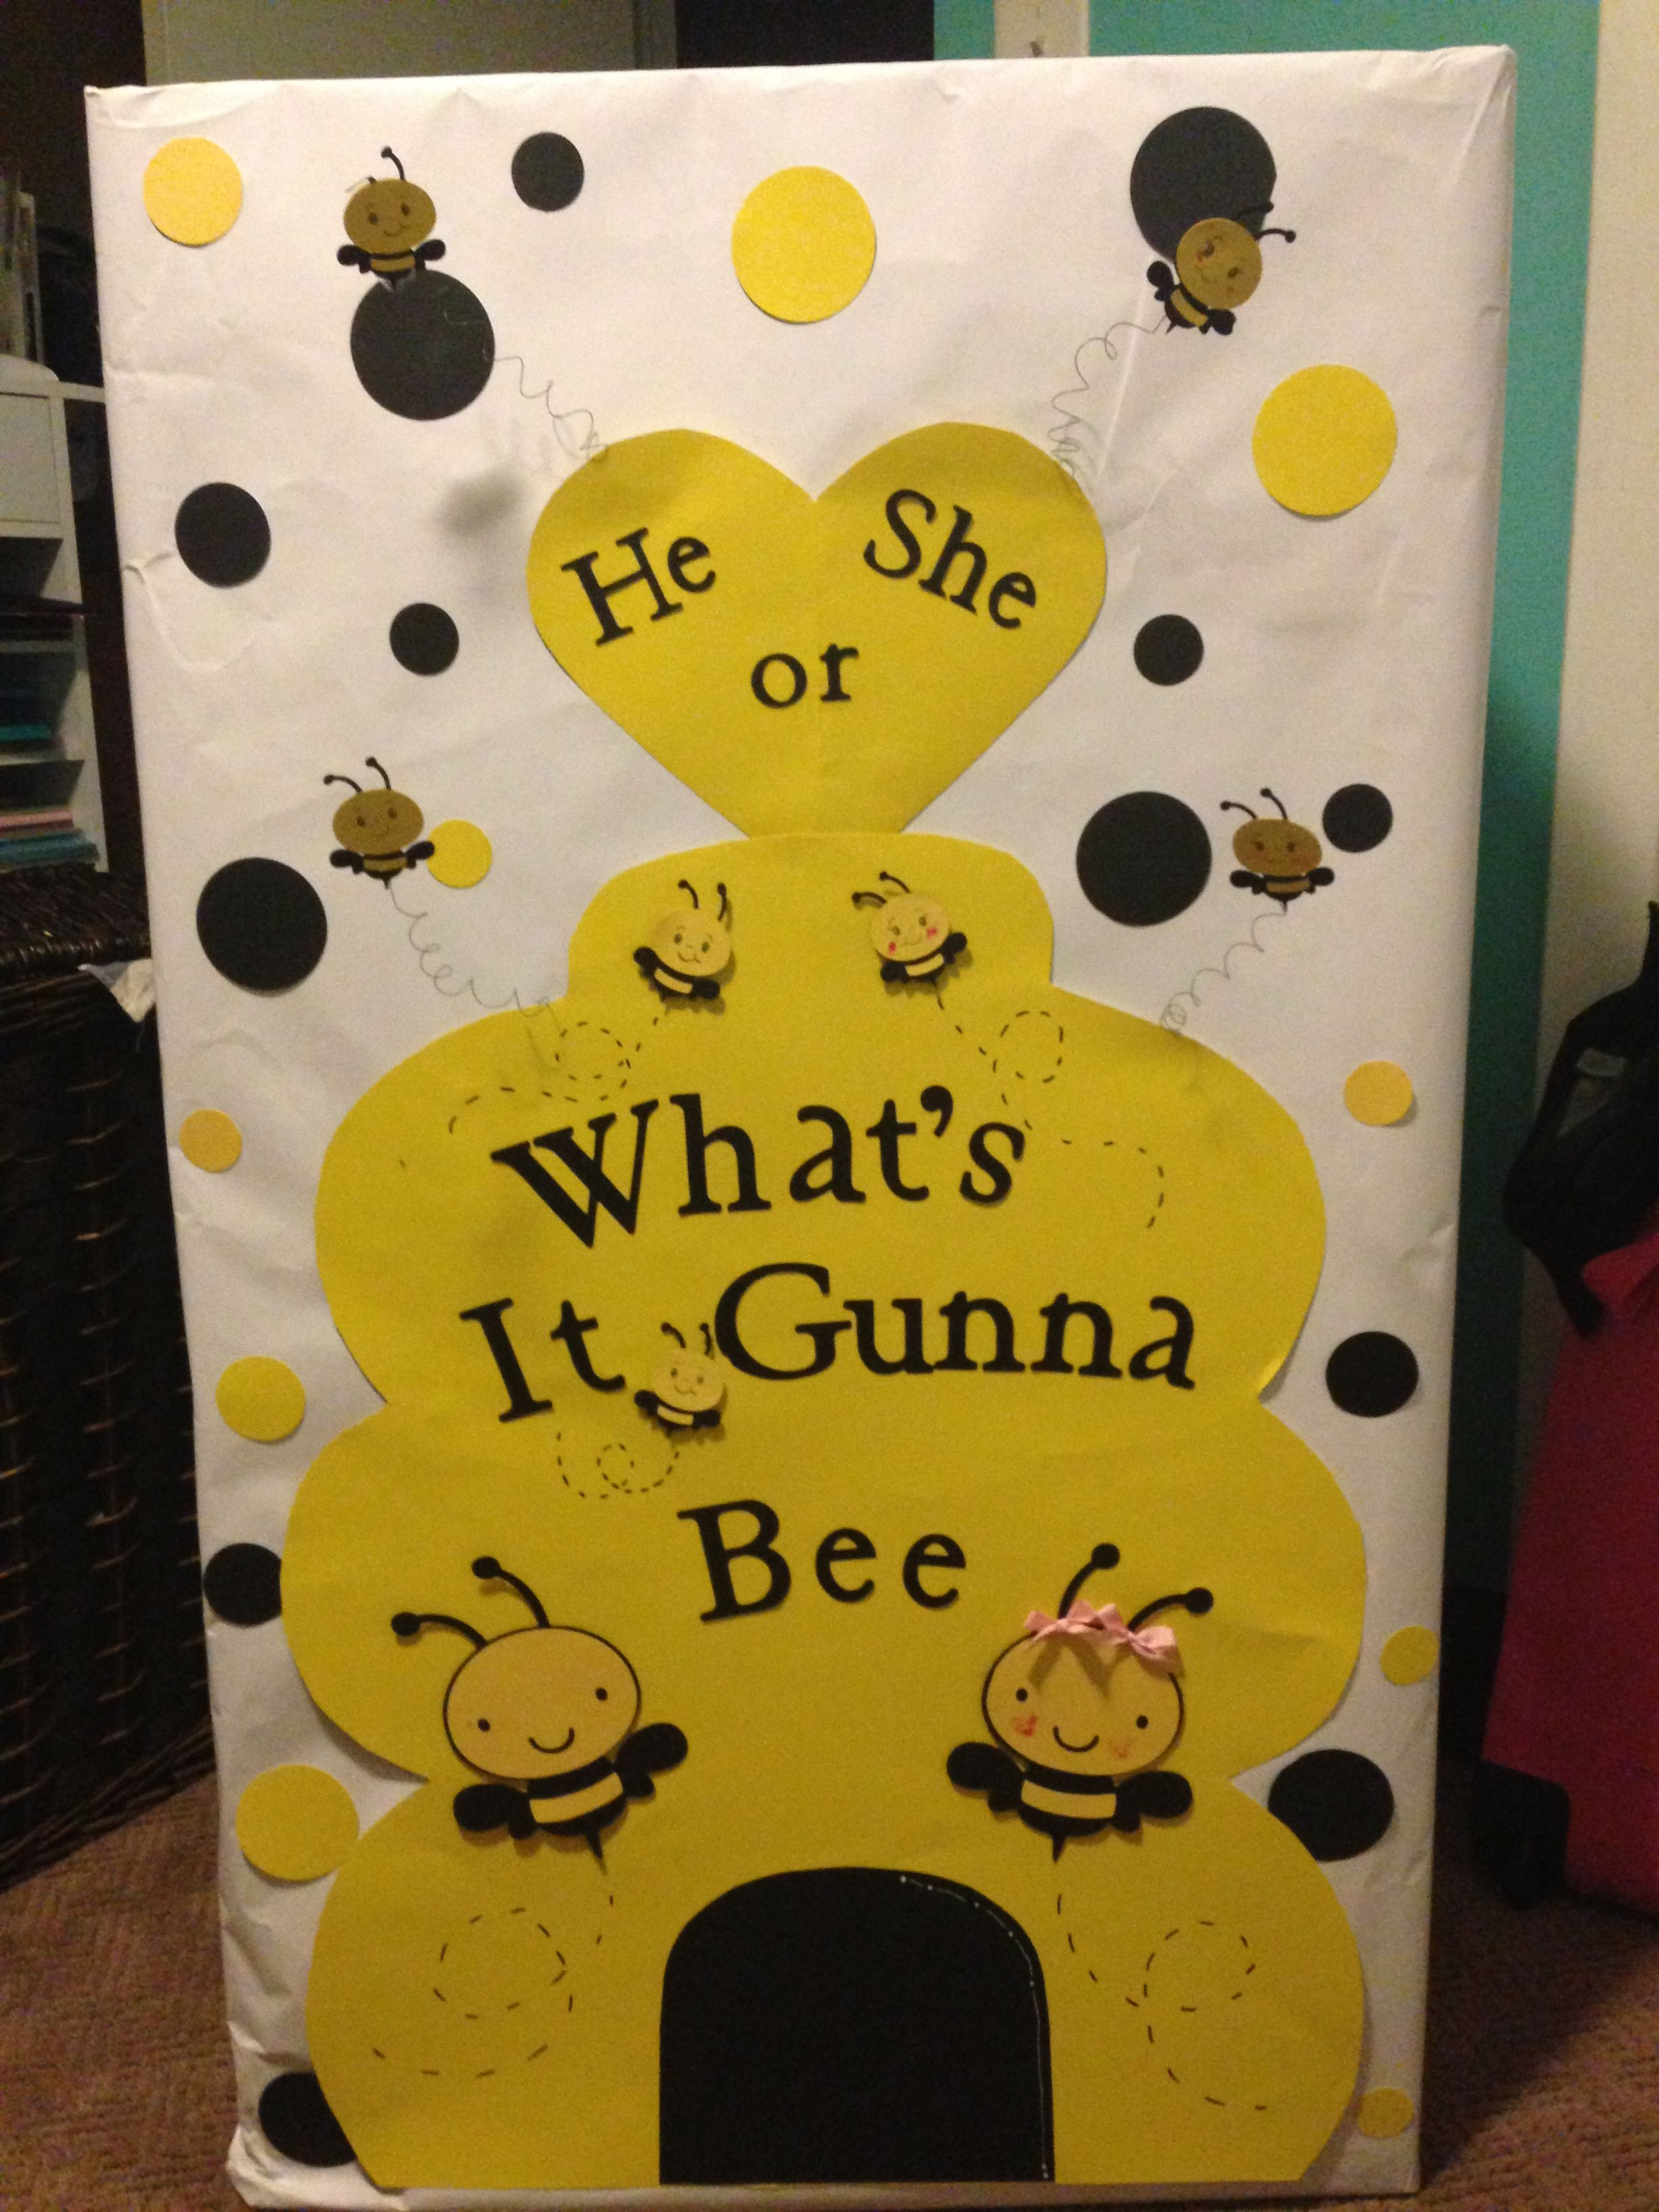 Pin By Tara Elizabeth On 3d Creations I Ve Made Bee Gender Reveal Baby Gender Reveal Party Baby Shower Gender Reveal